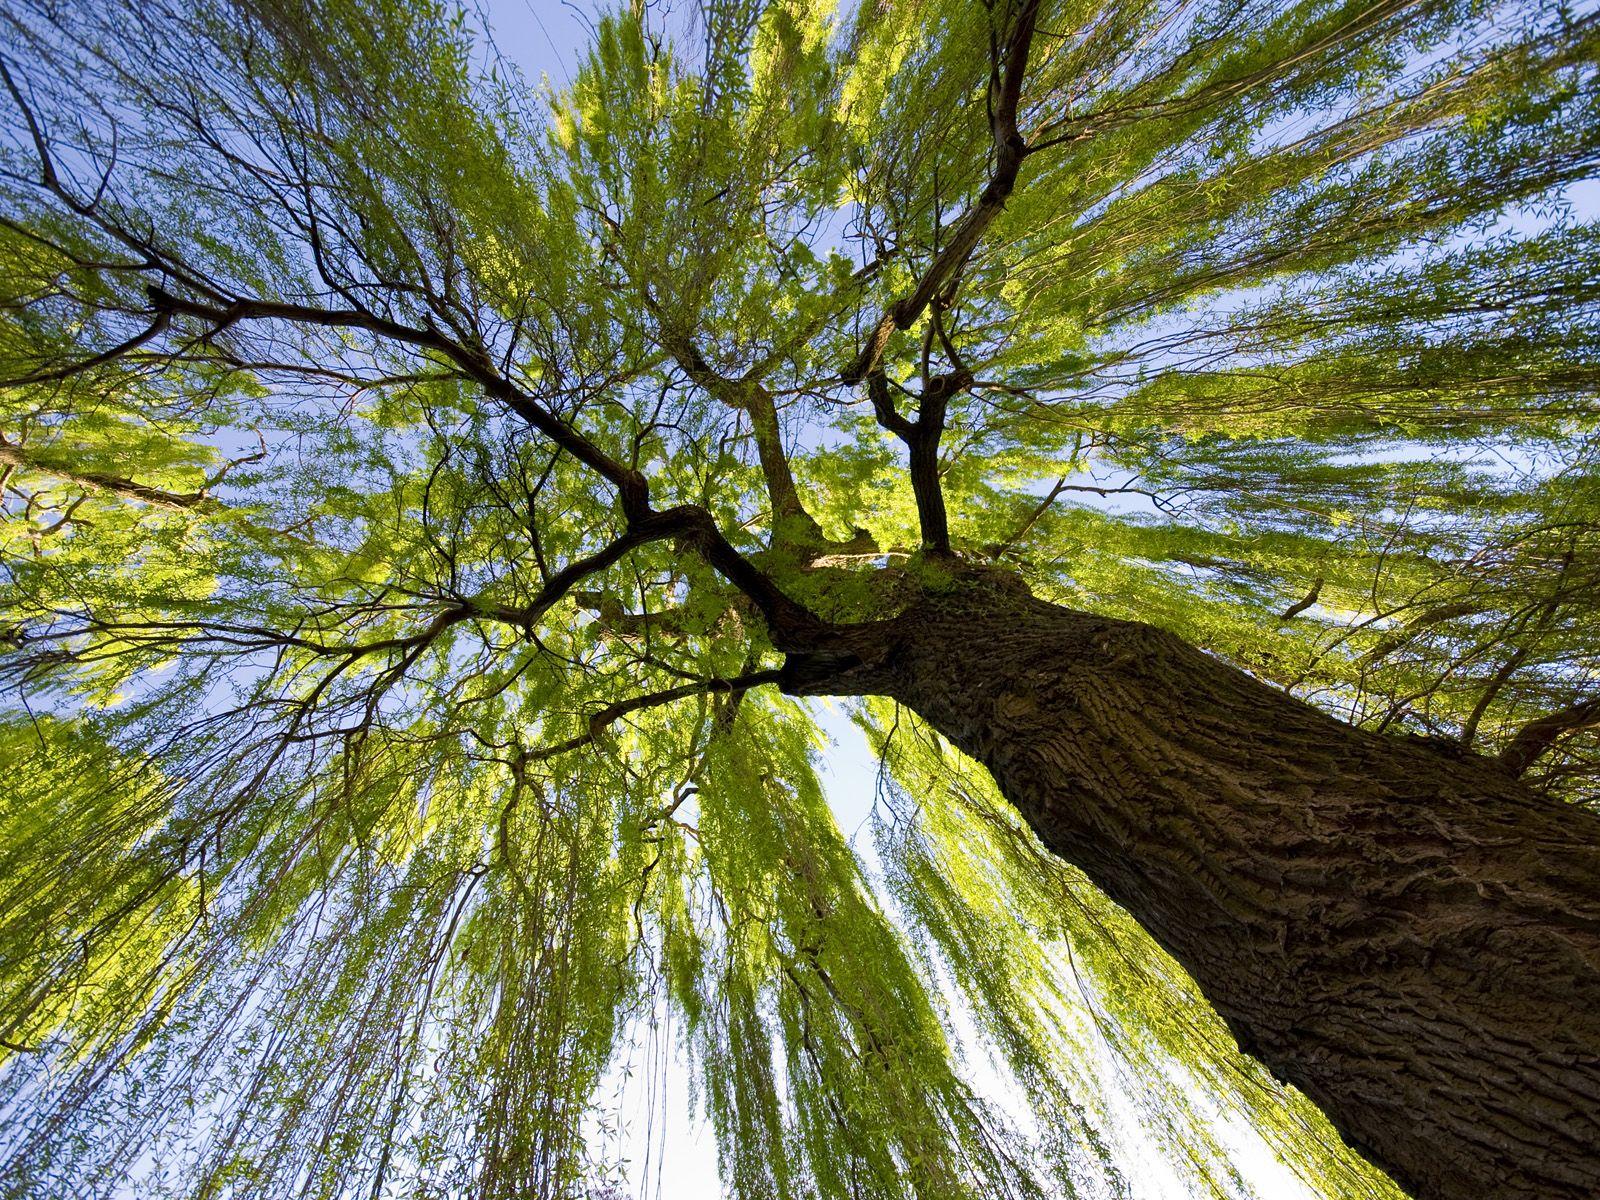 WILLOW TREE PNG에 대한 이미지 검색결과